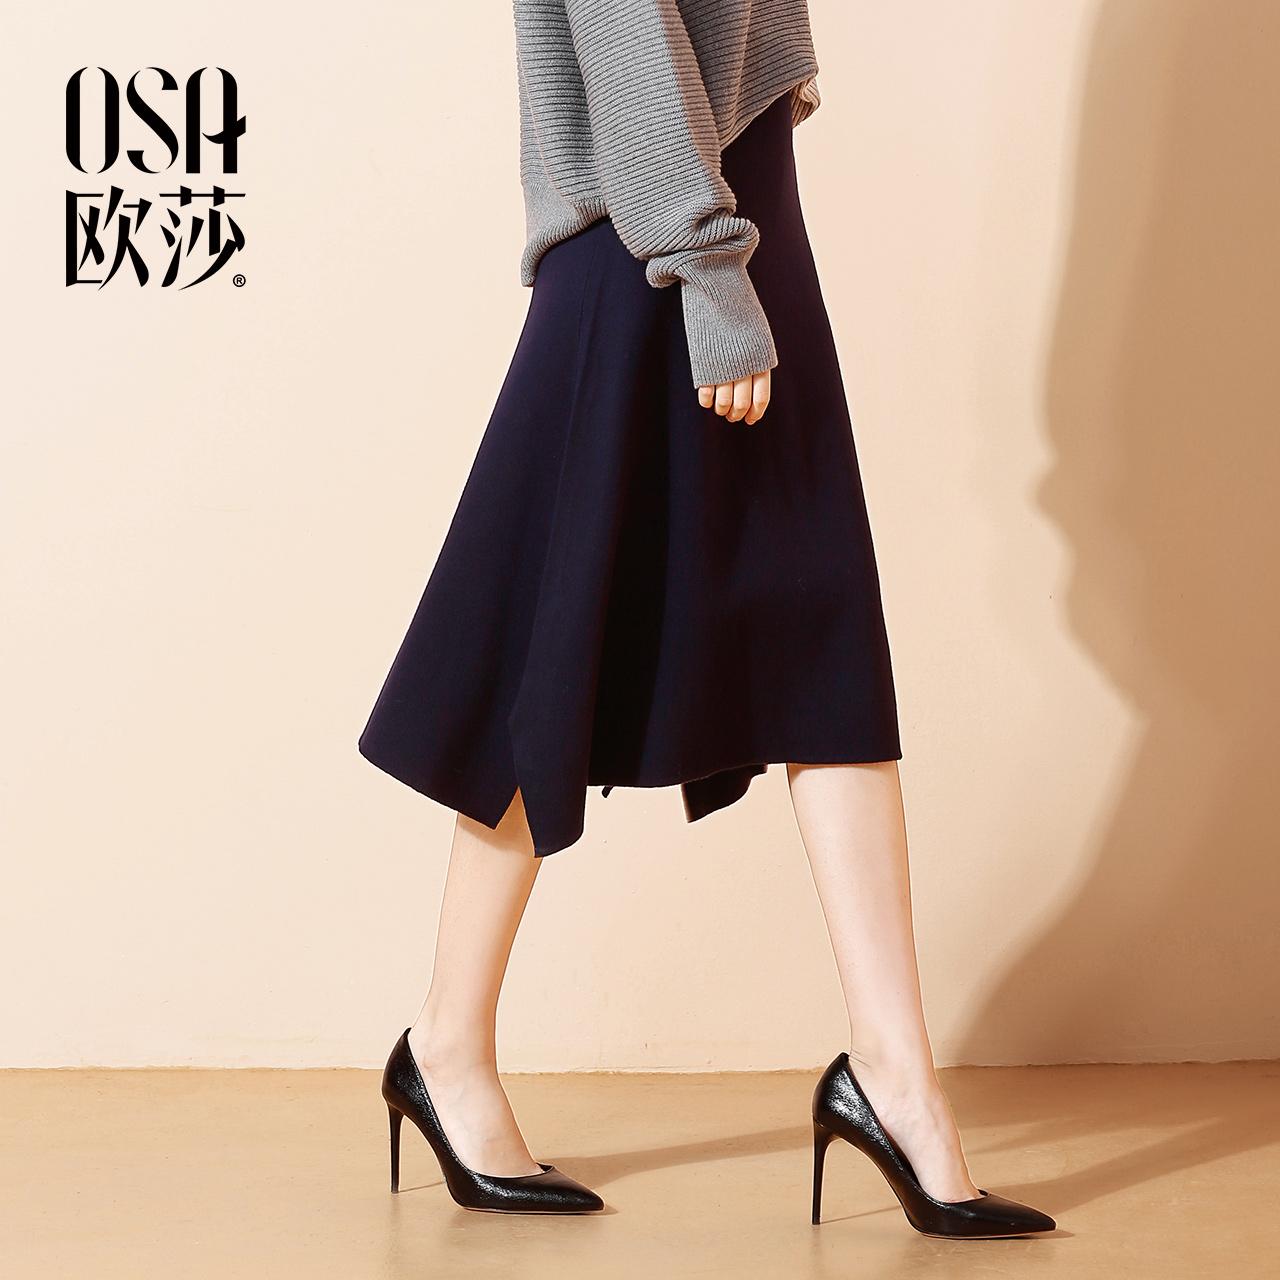 OSA荷叶边裙价格,连衣裙质量评价